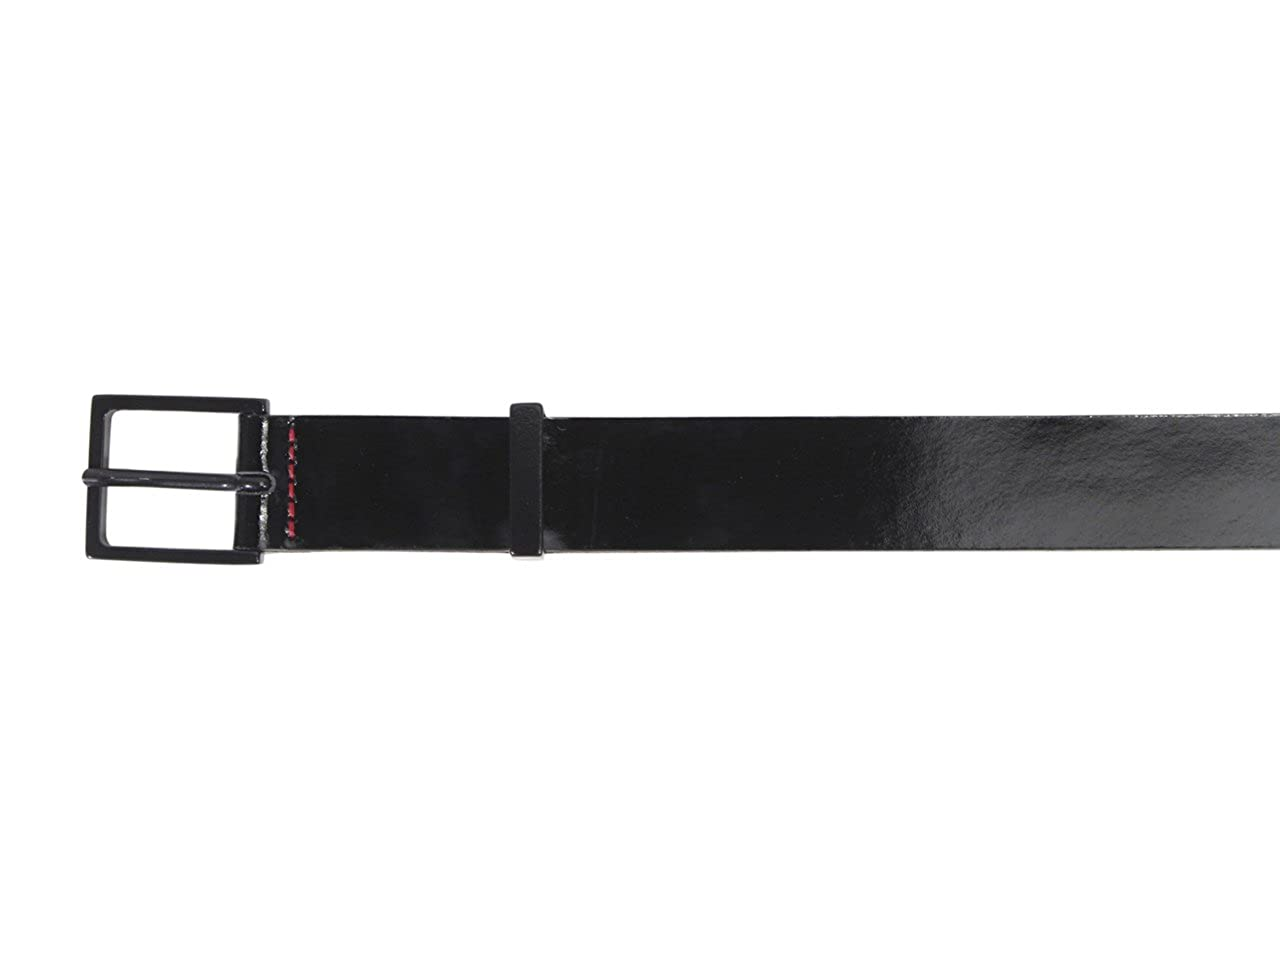 Hugo Boss Mens Gis Genuine Patent Leather Belt